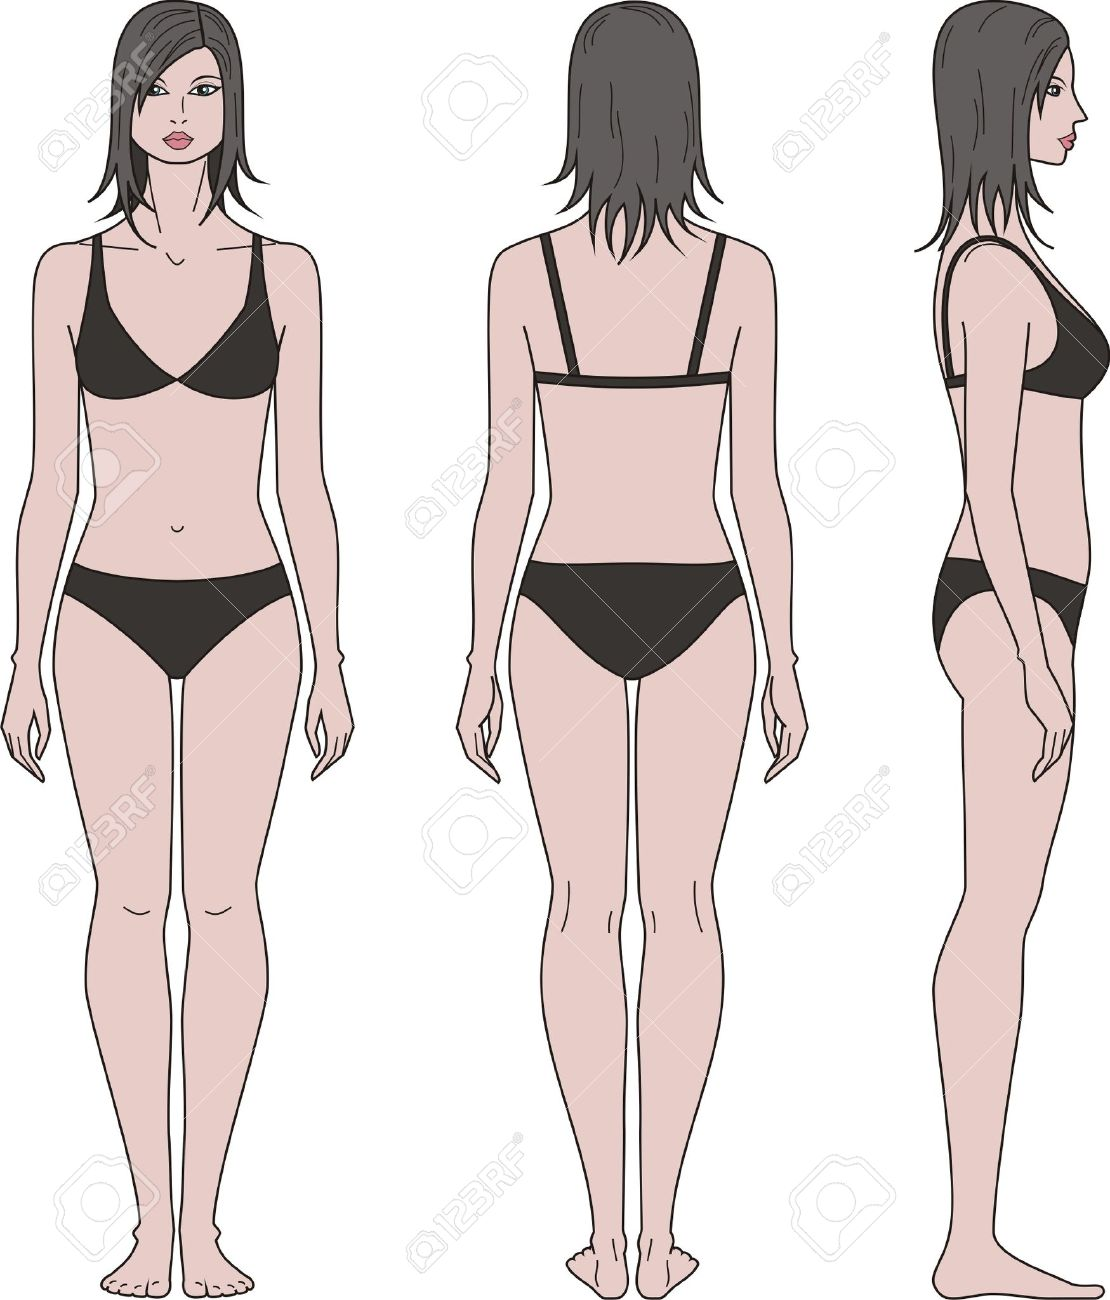 vector illustration of women s figure front back side views